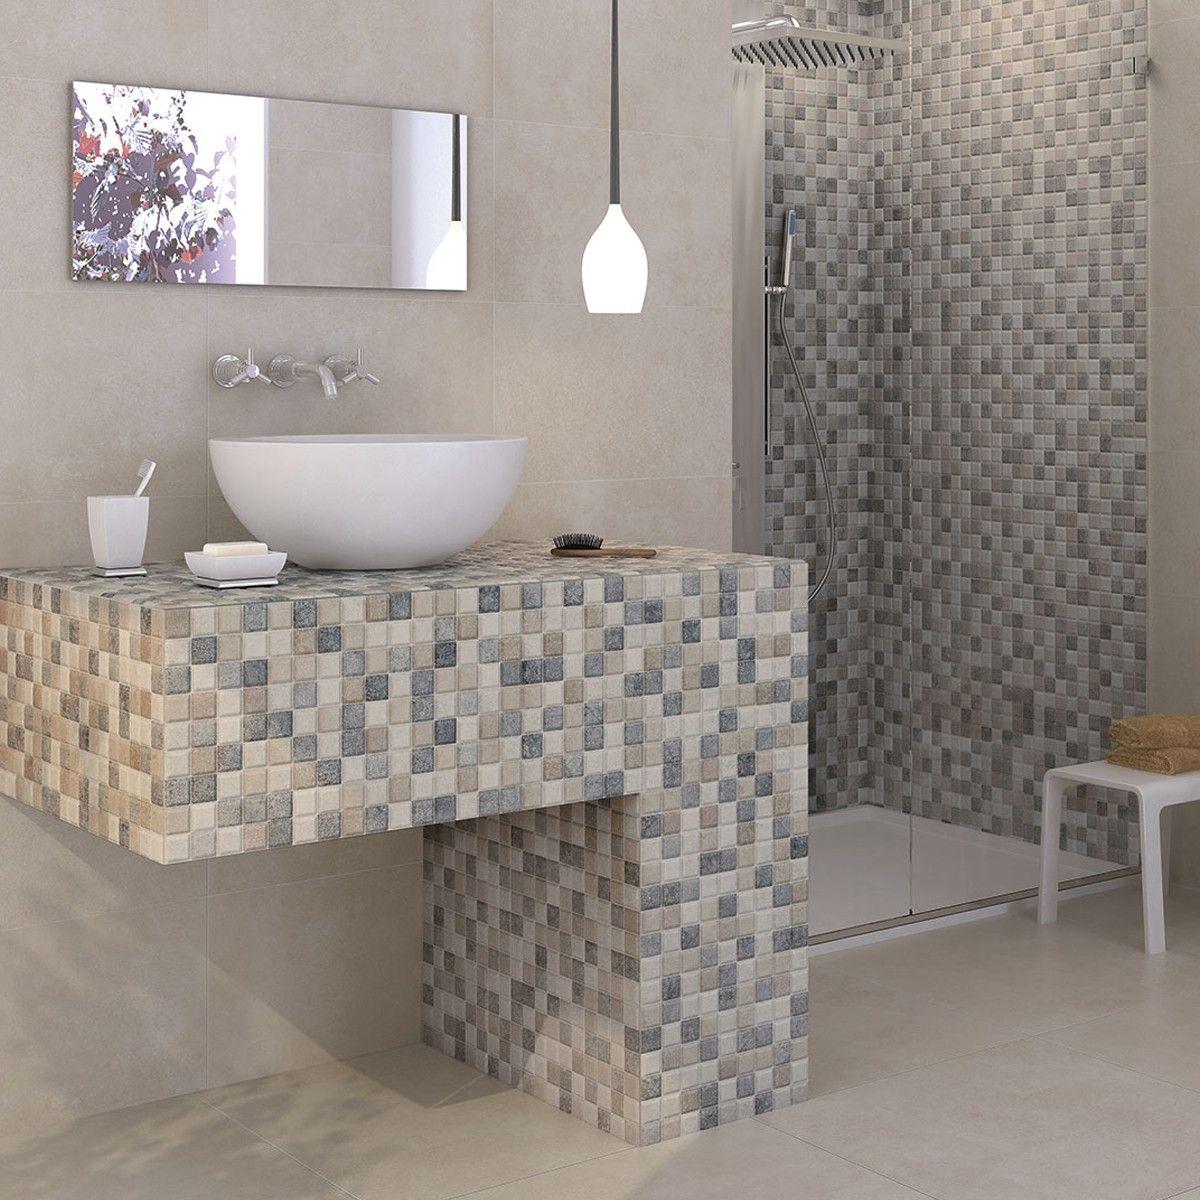 55x33.3 Atrium Kiel RLV Mosaic - Crown Tiles | Bathroom Tiles ...